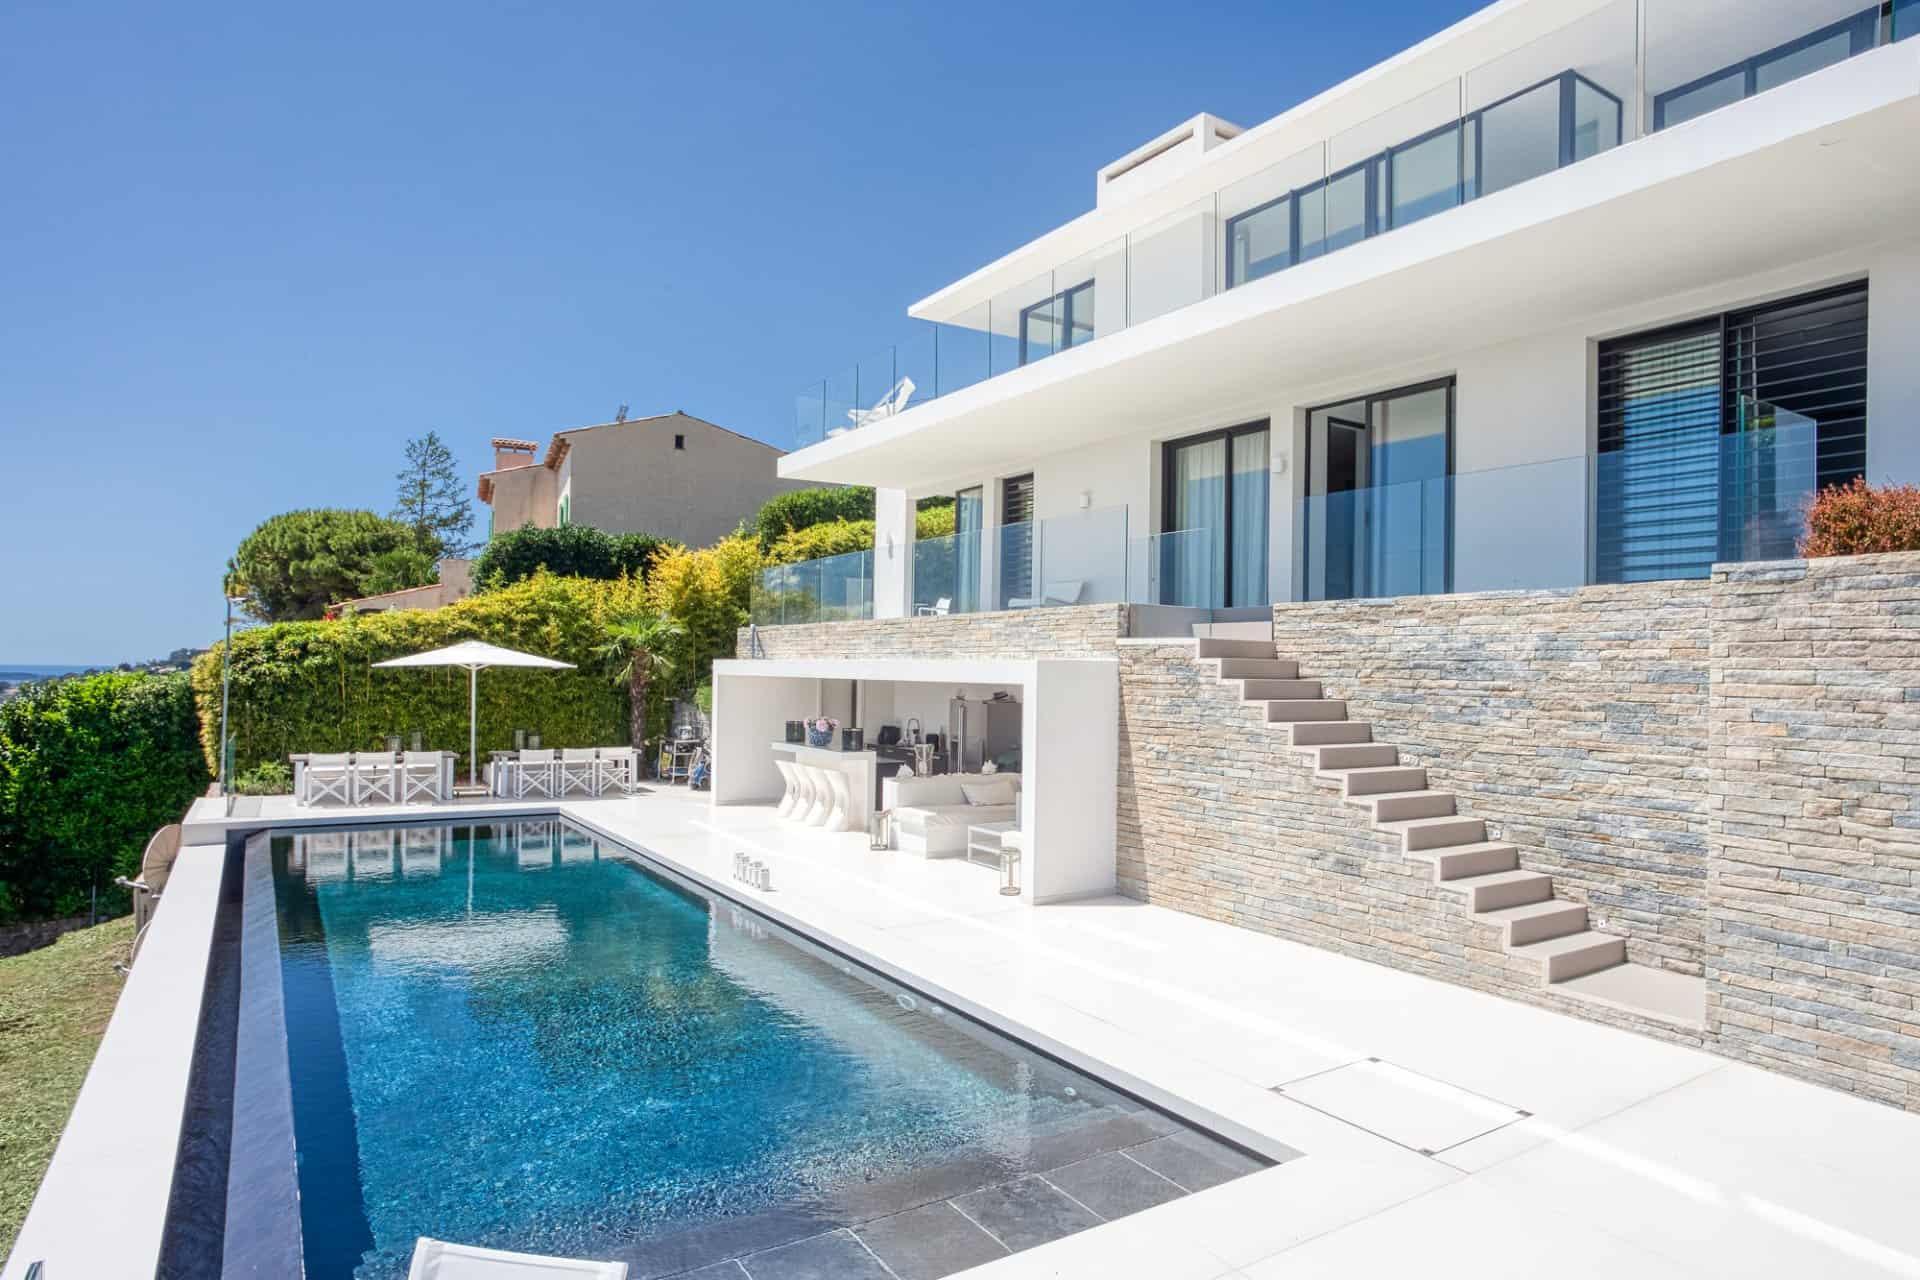 contemporary-villa-for-sale-golfe-juan-breathtaking-views-cap-antibes-infinity-pool-terrace-summer-kitchen